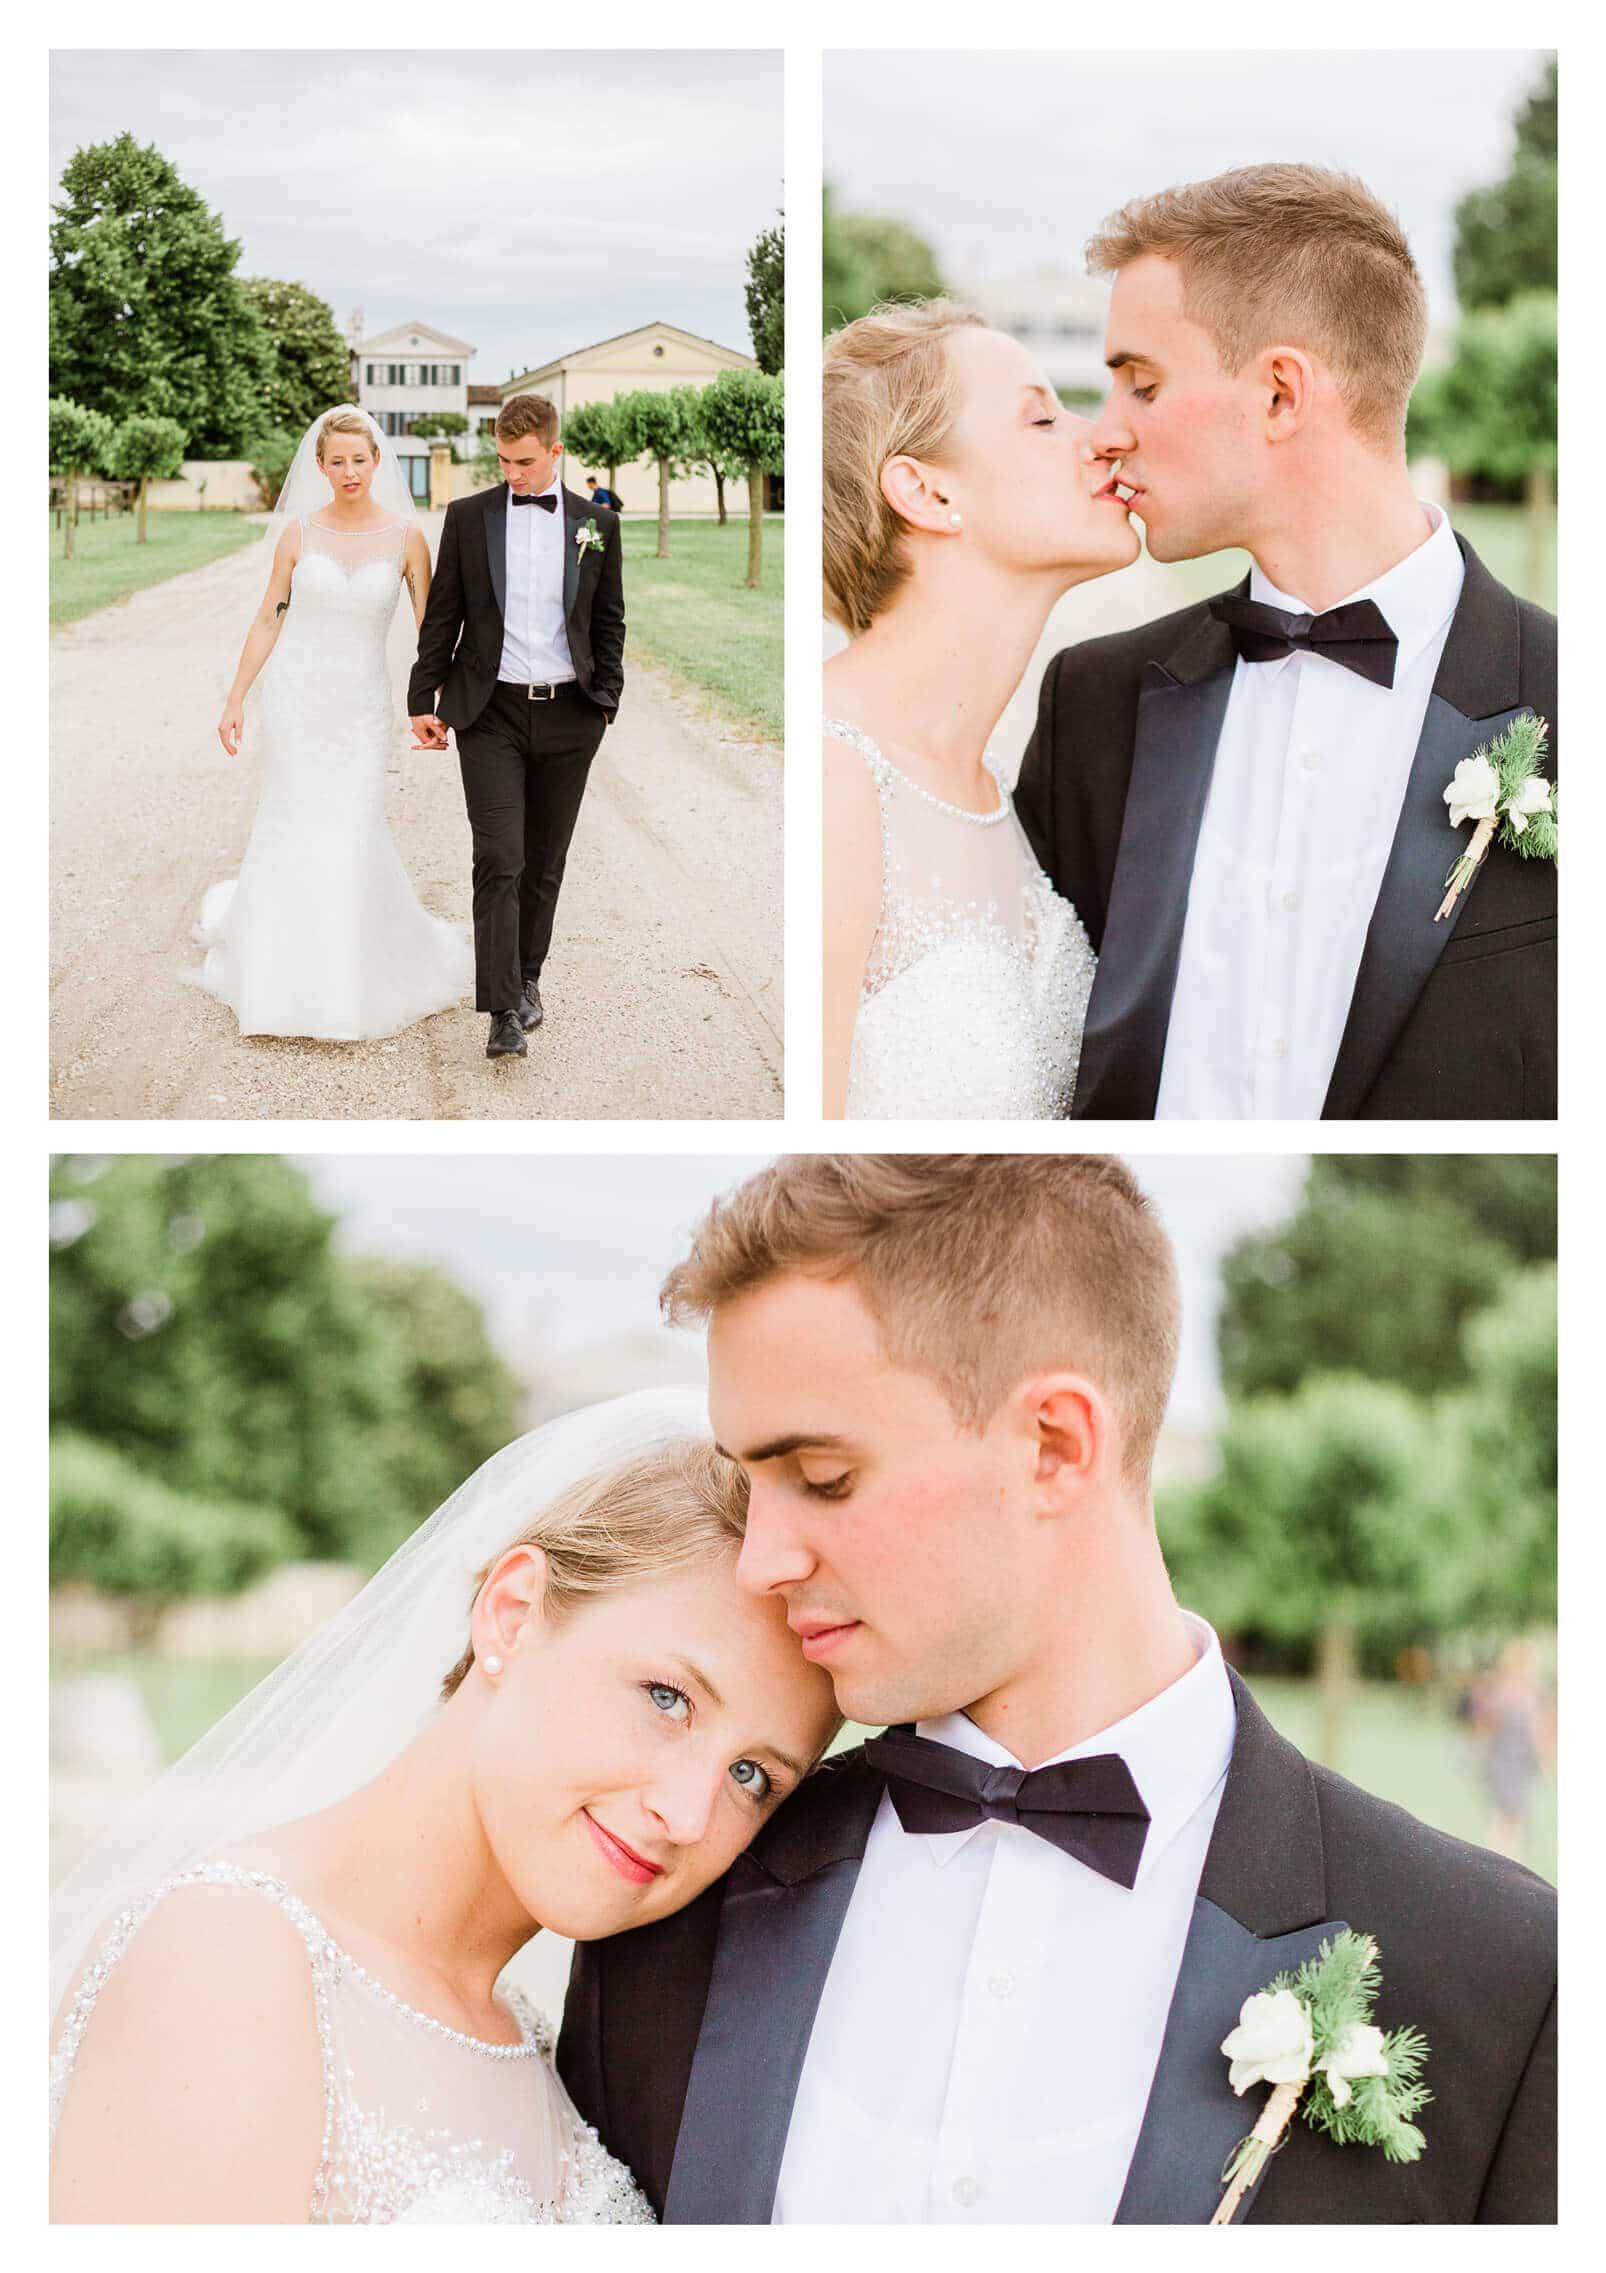 Relaxed wedding couple portraits | Destination photographer